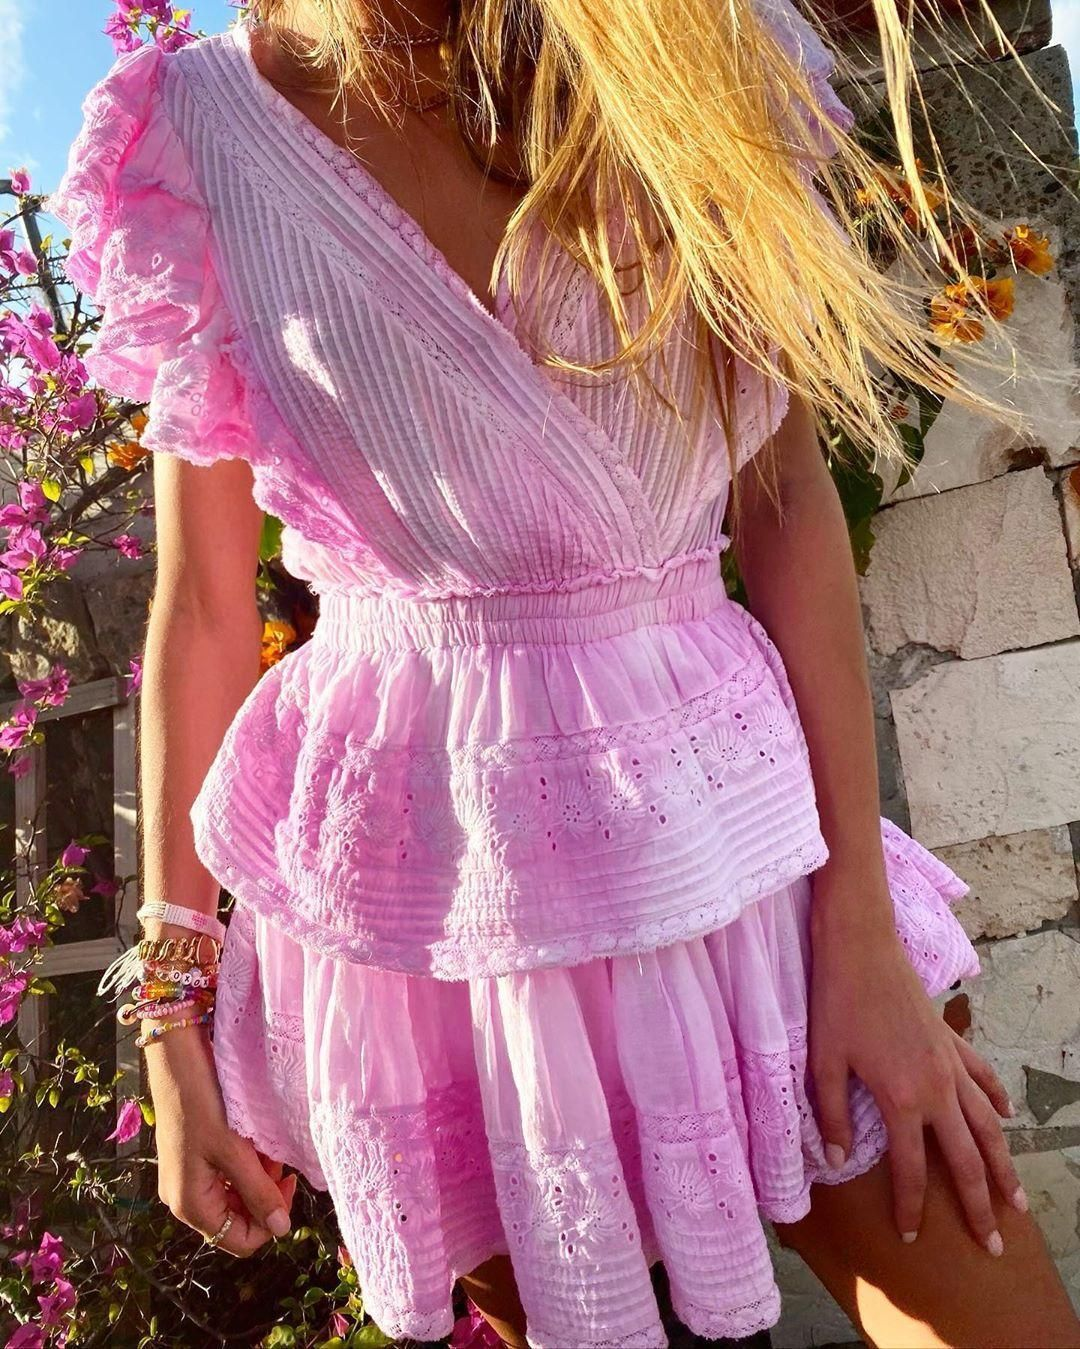 Dress, $395 at loveshackfancy.com - Wheretoget ✰ 𝚙